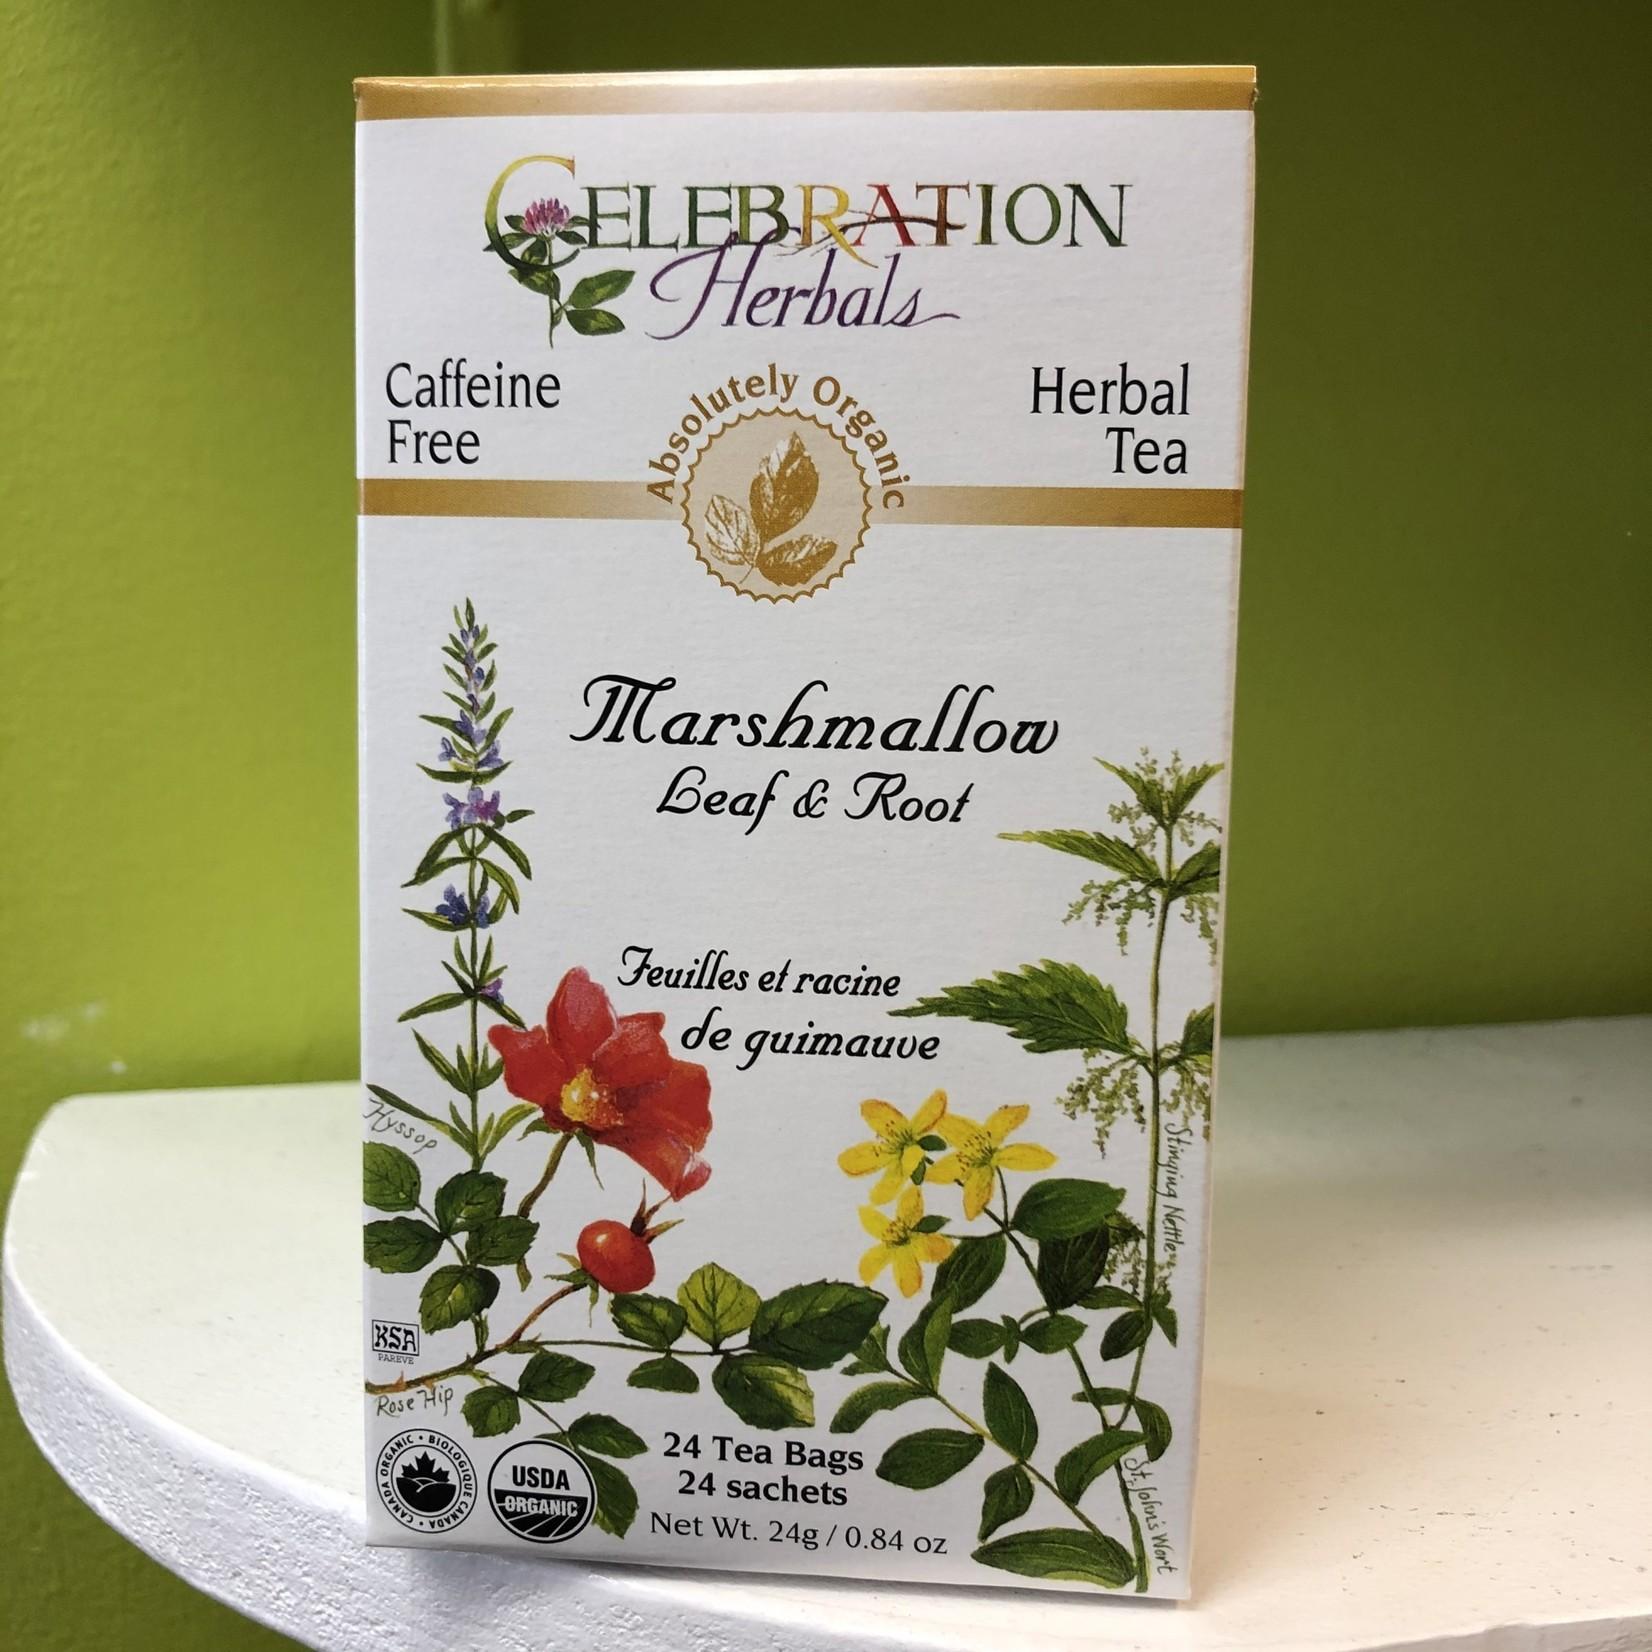 Celebration Herbals Celebration Herbals Marshmallow Tea 24 Tea Bags